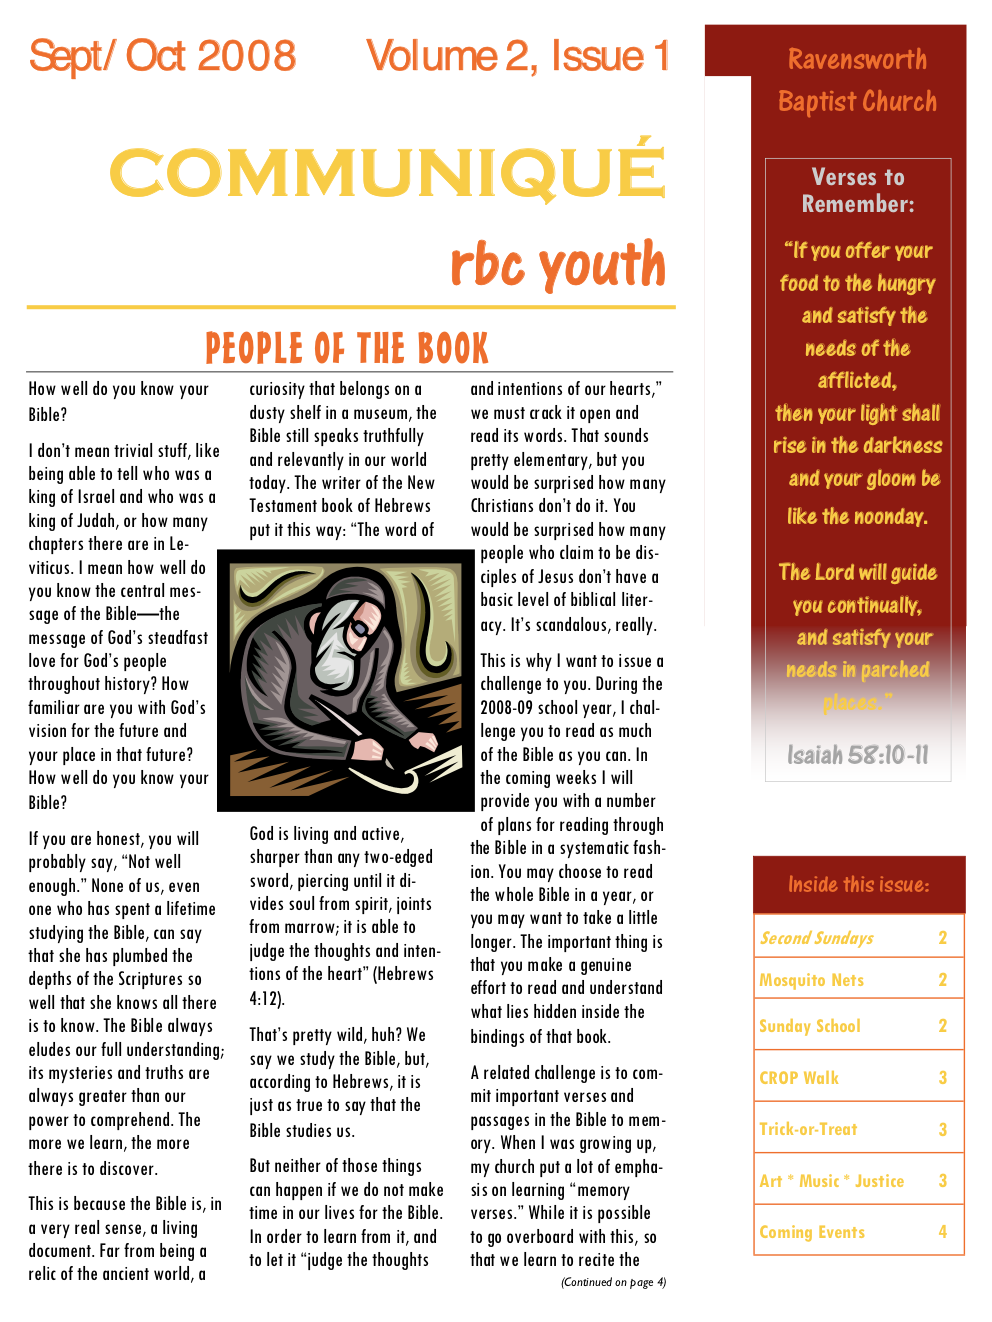 Ravensworth Baptist Church Youth Newsletter, Sep 2008